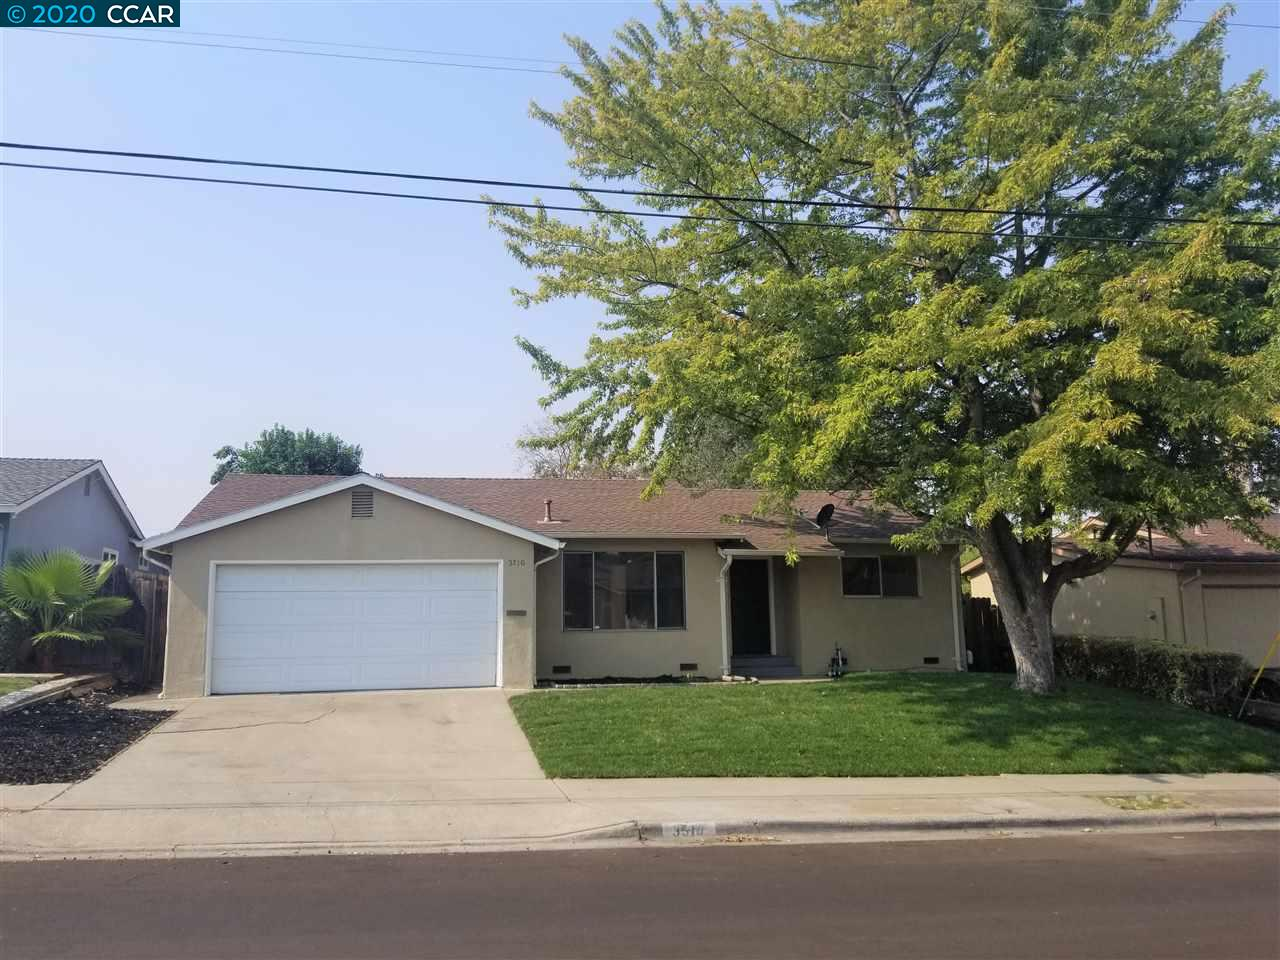 3510 Camby Rd, ANTIOCH, CA 94509